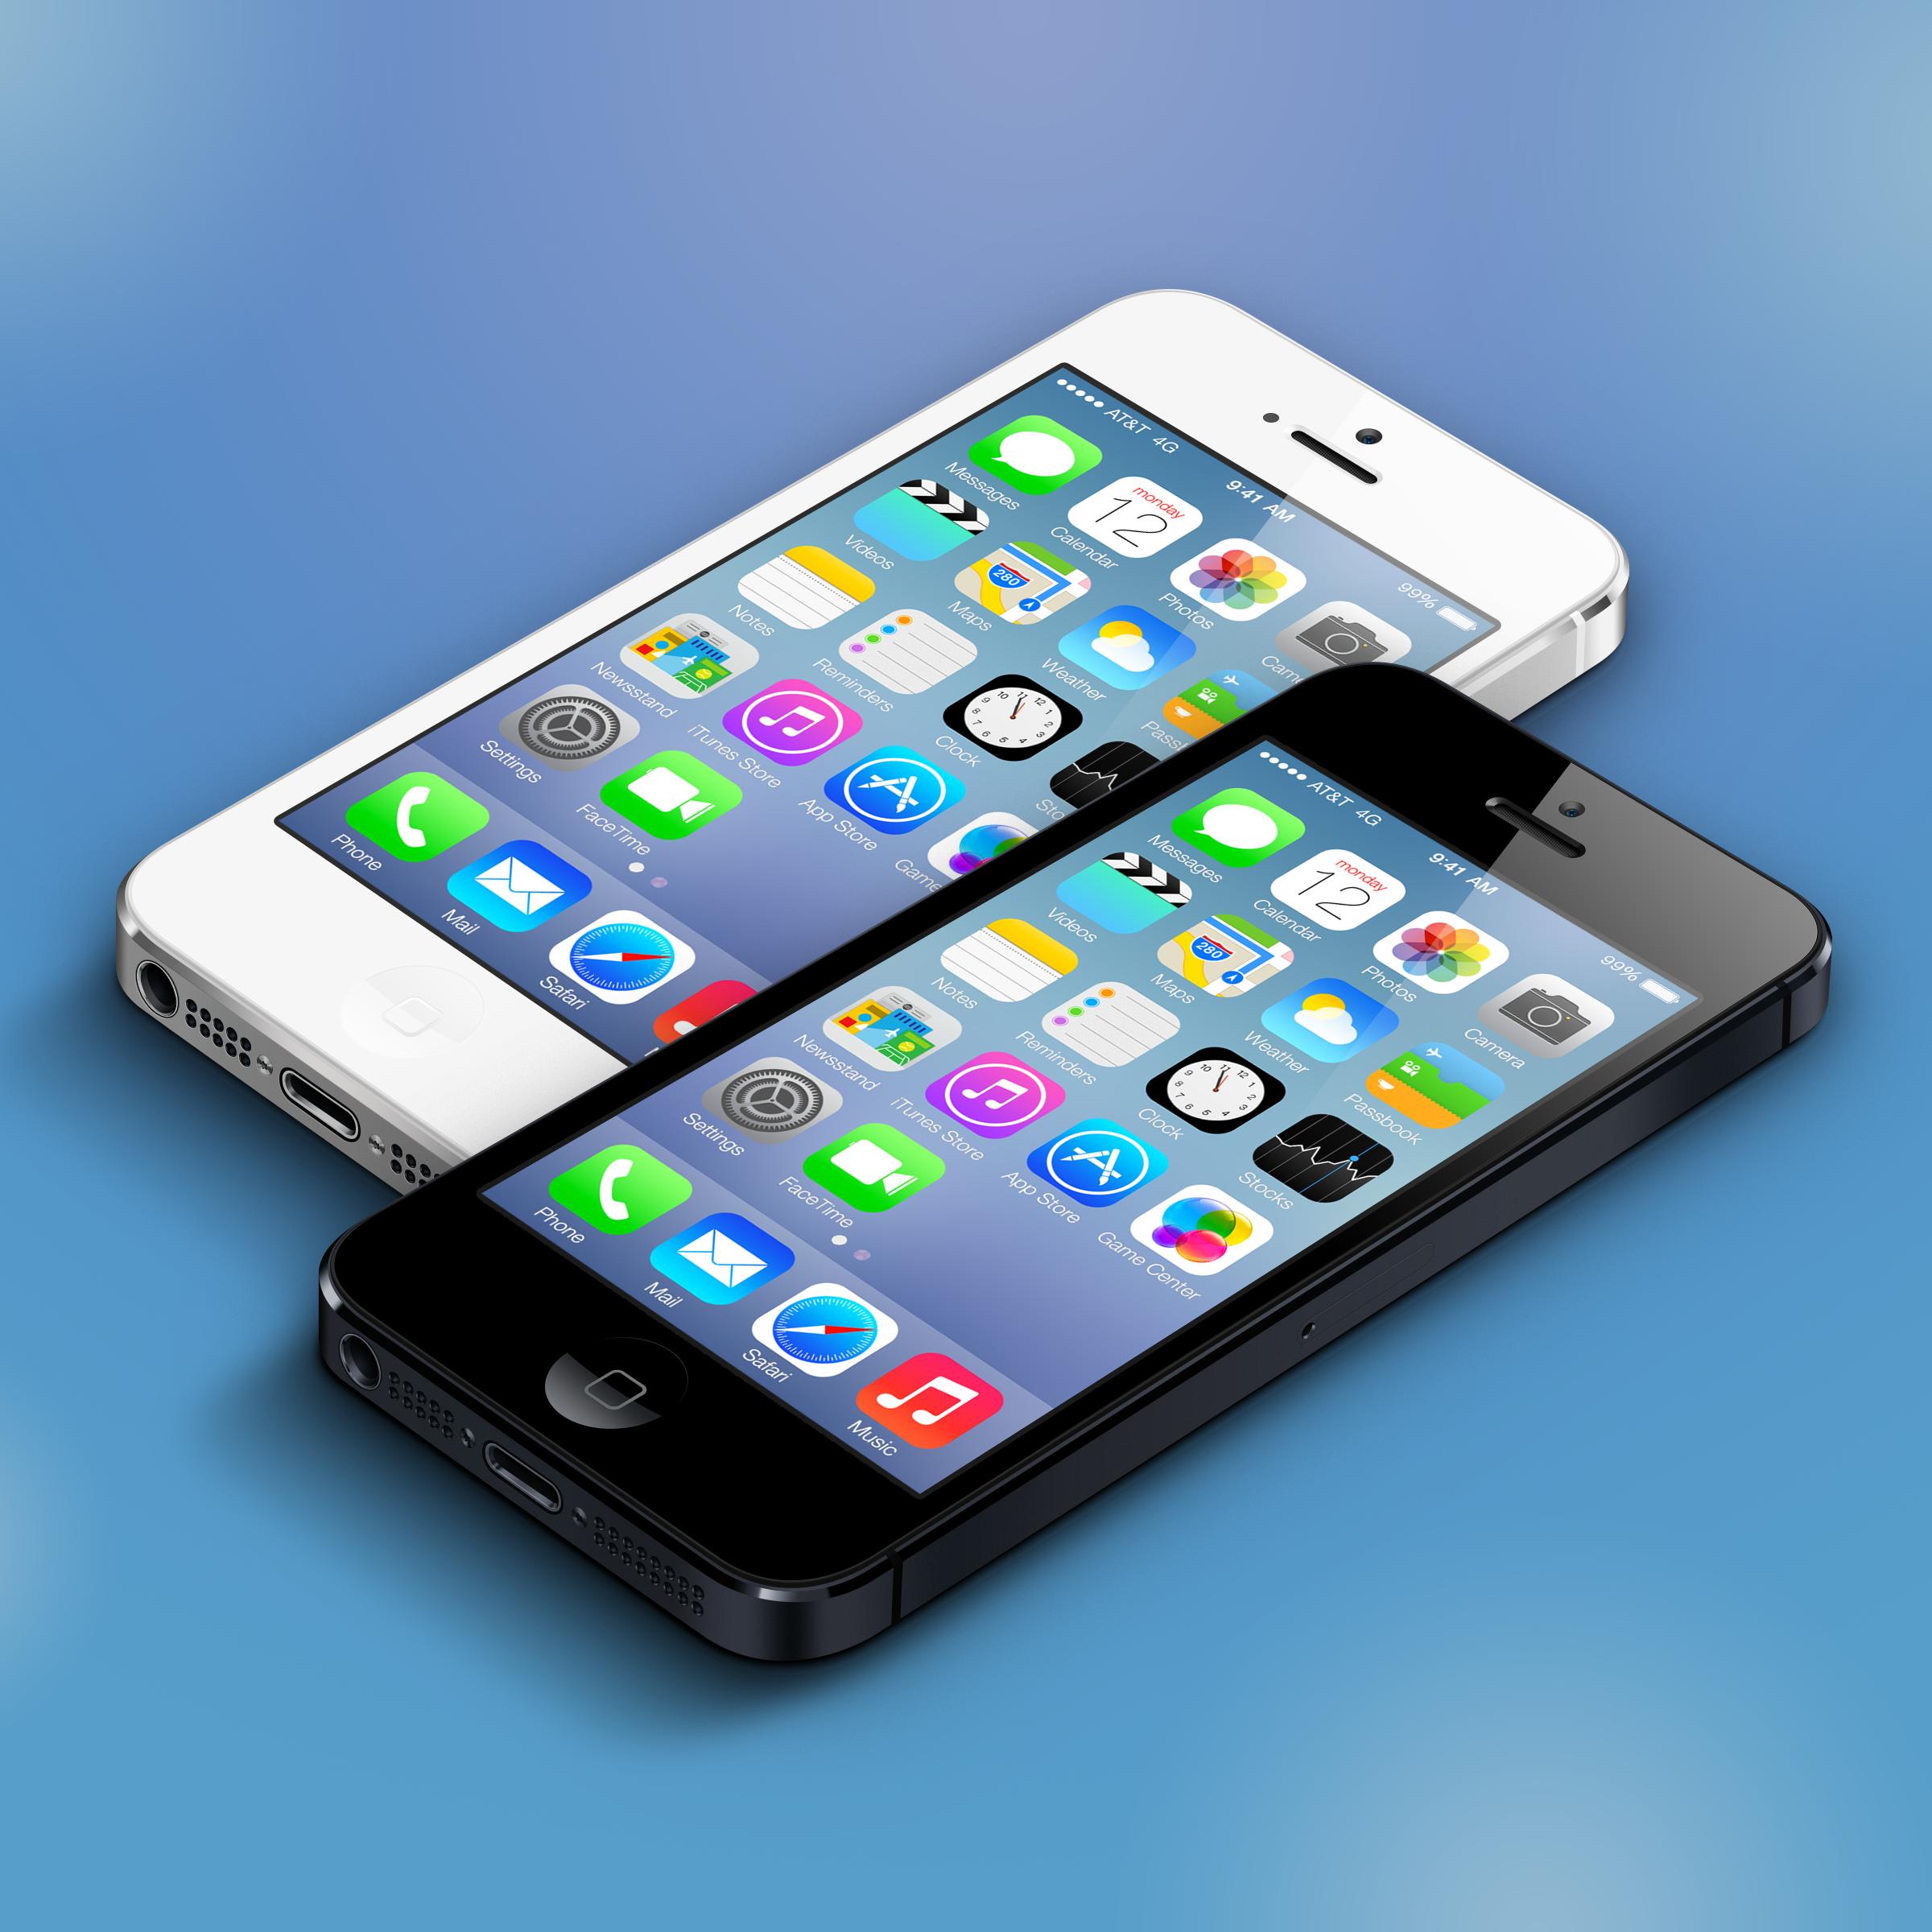 Wallpapers for iphone 5 iphone 4 iphone 5 iphone 5 ios 7 iphone wallpapers for iphone 5 iphone 4 iphone 5 iphone 5 ios 7 iphone voltagebd Gallery